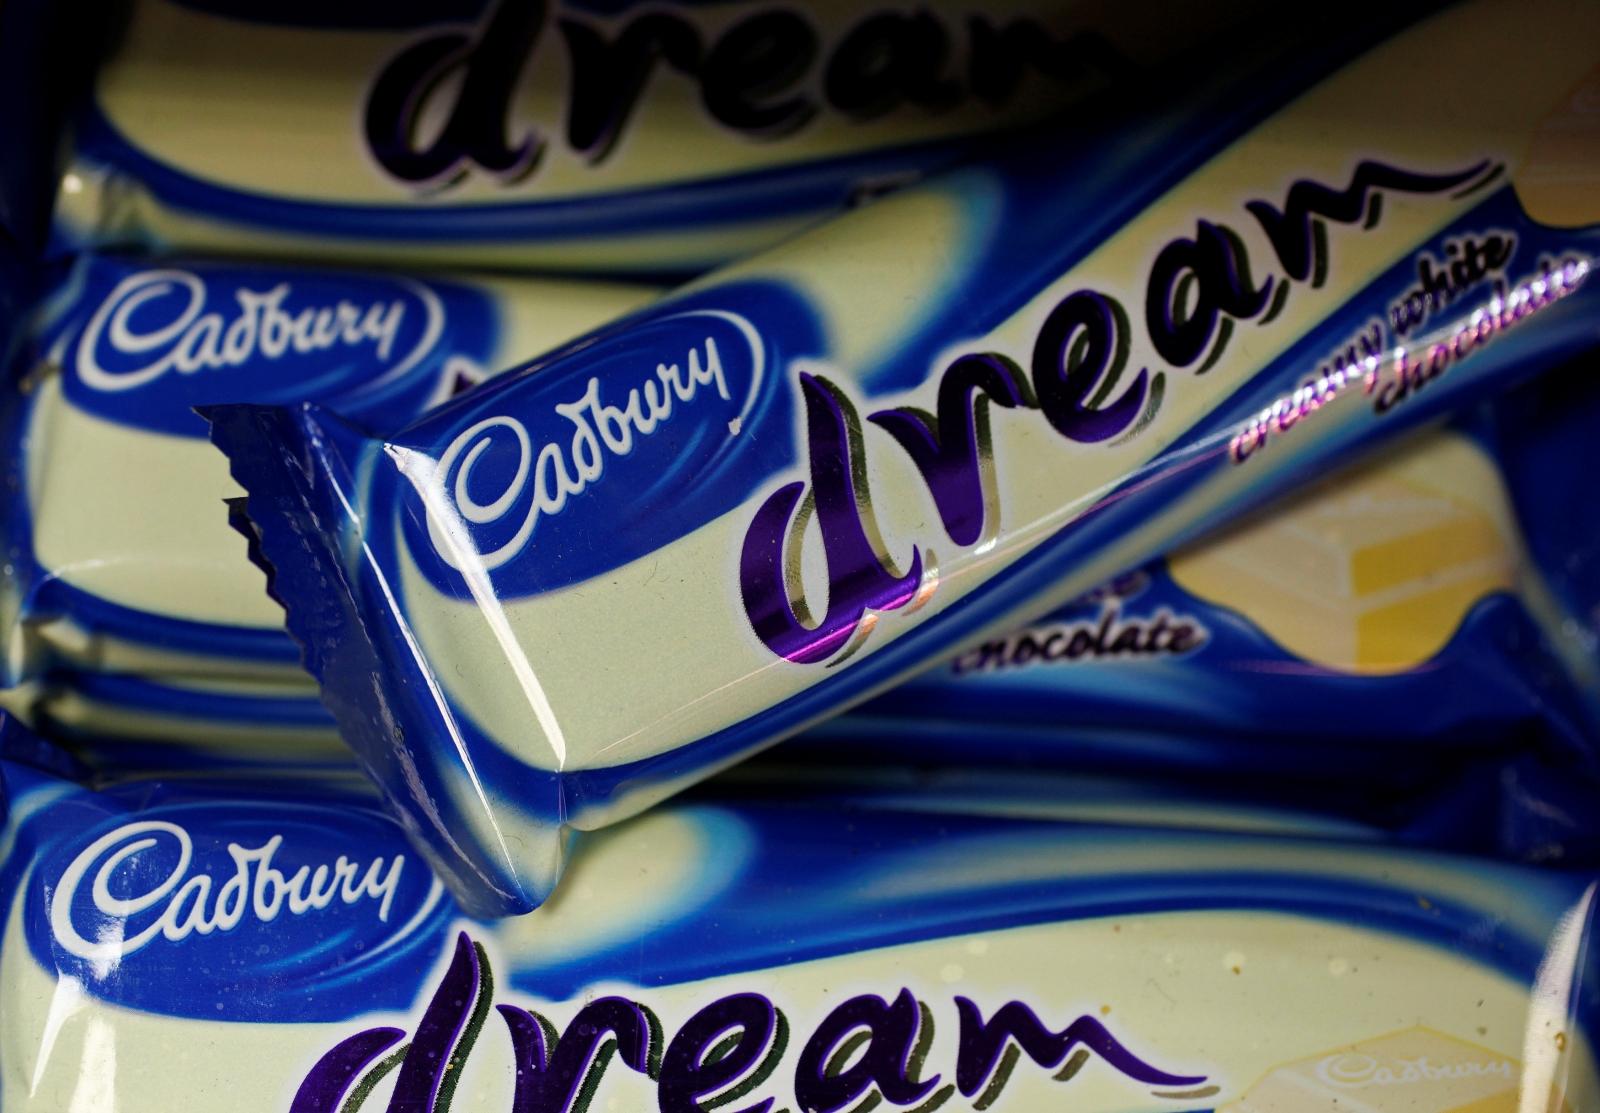 Cadbury's chocolates